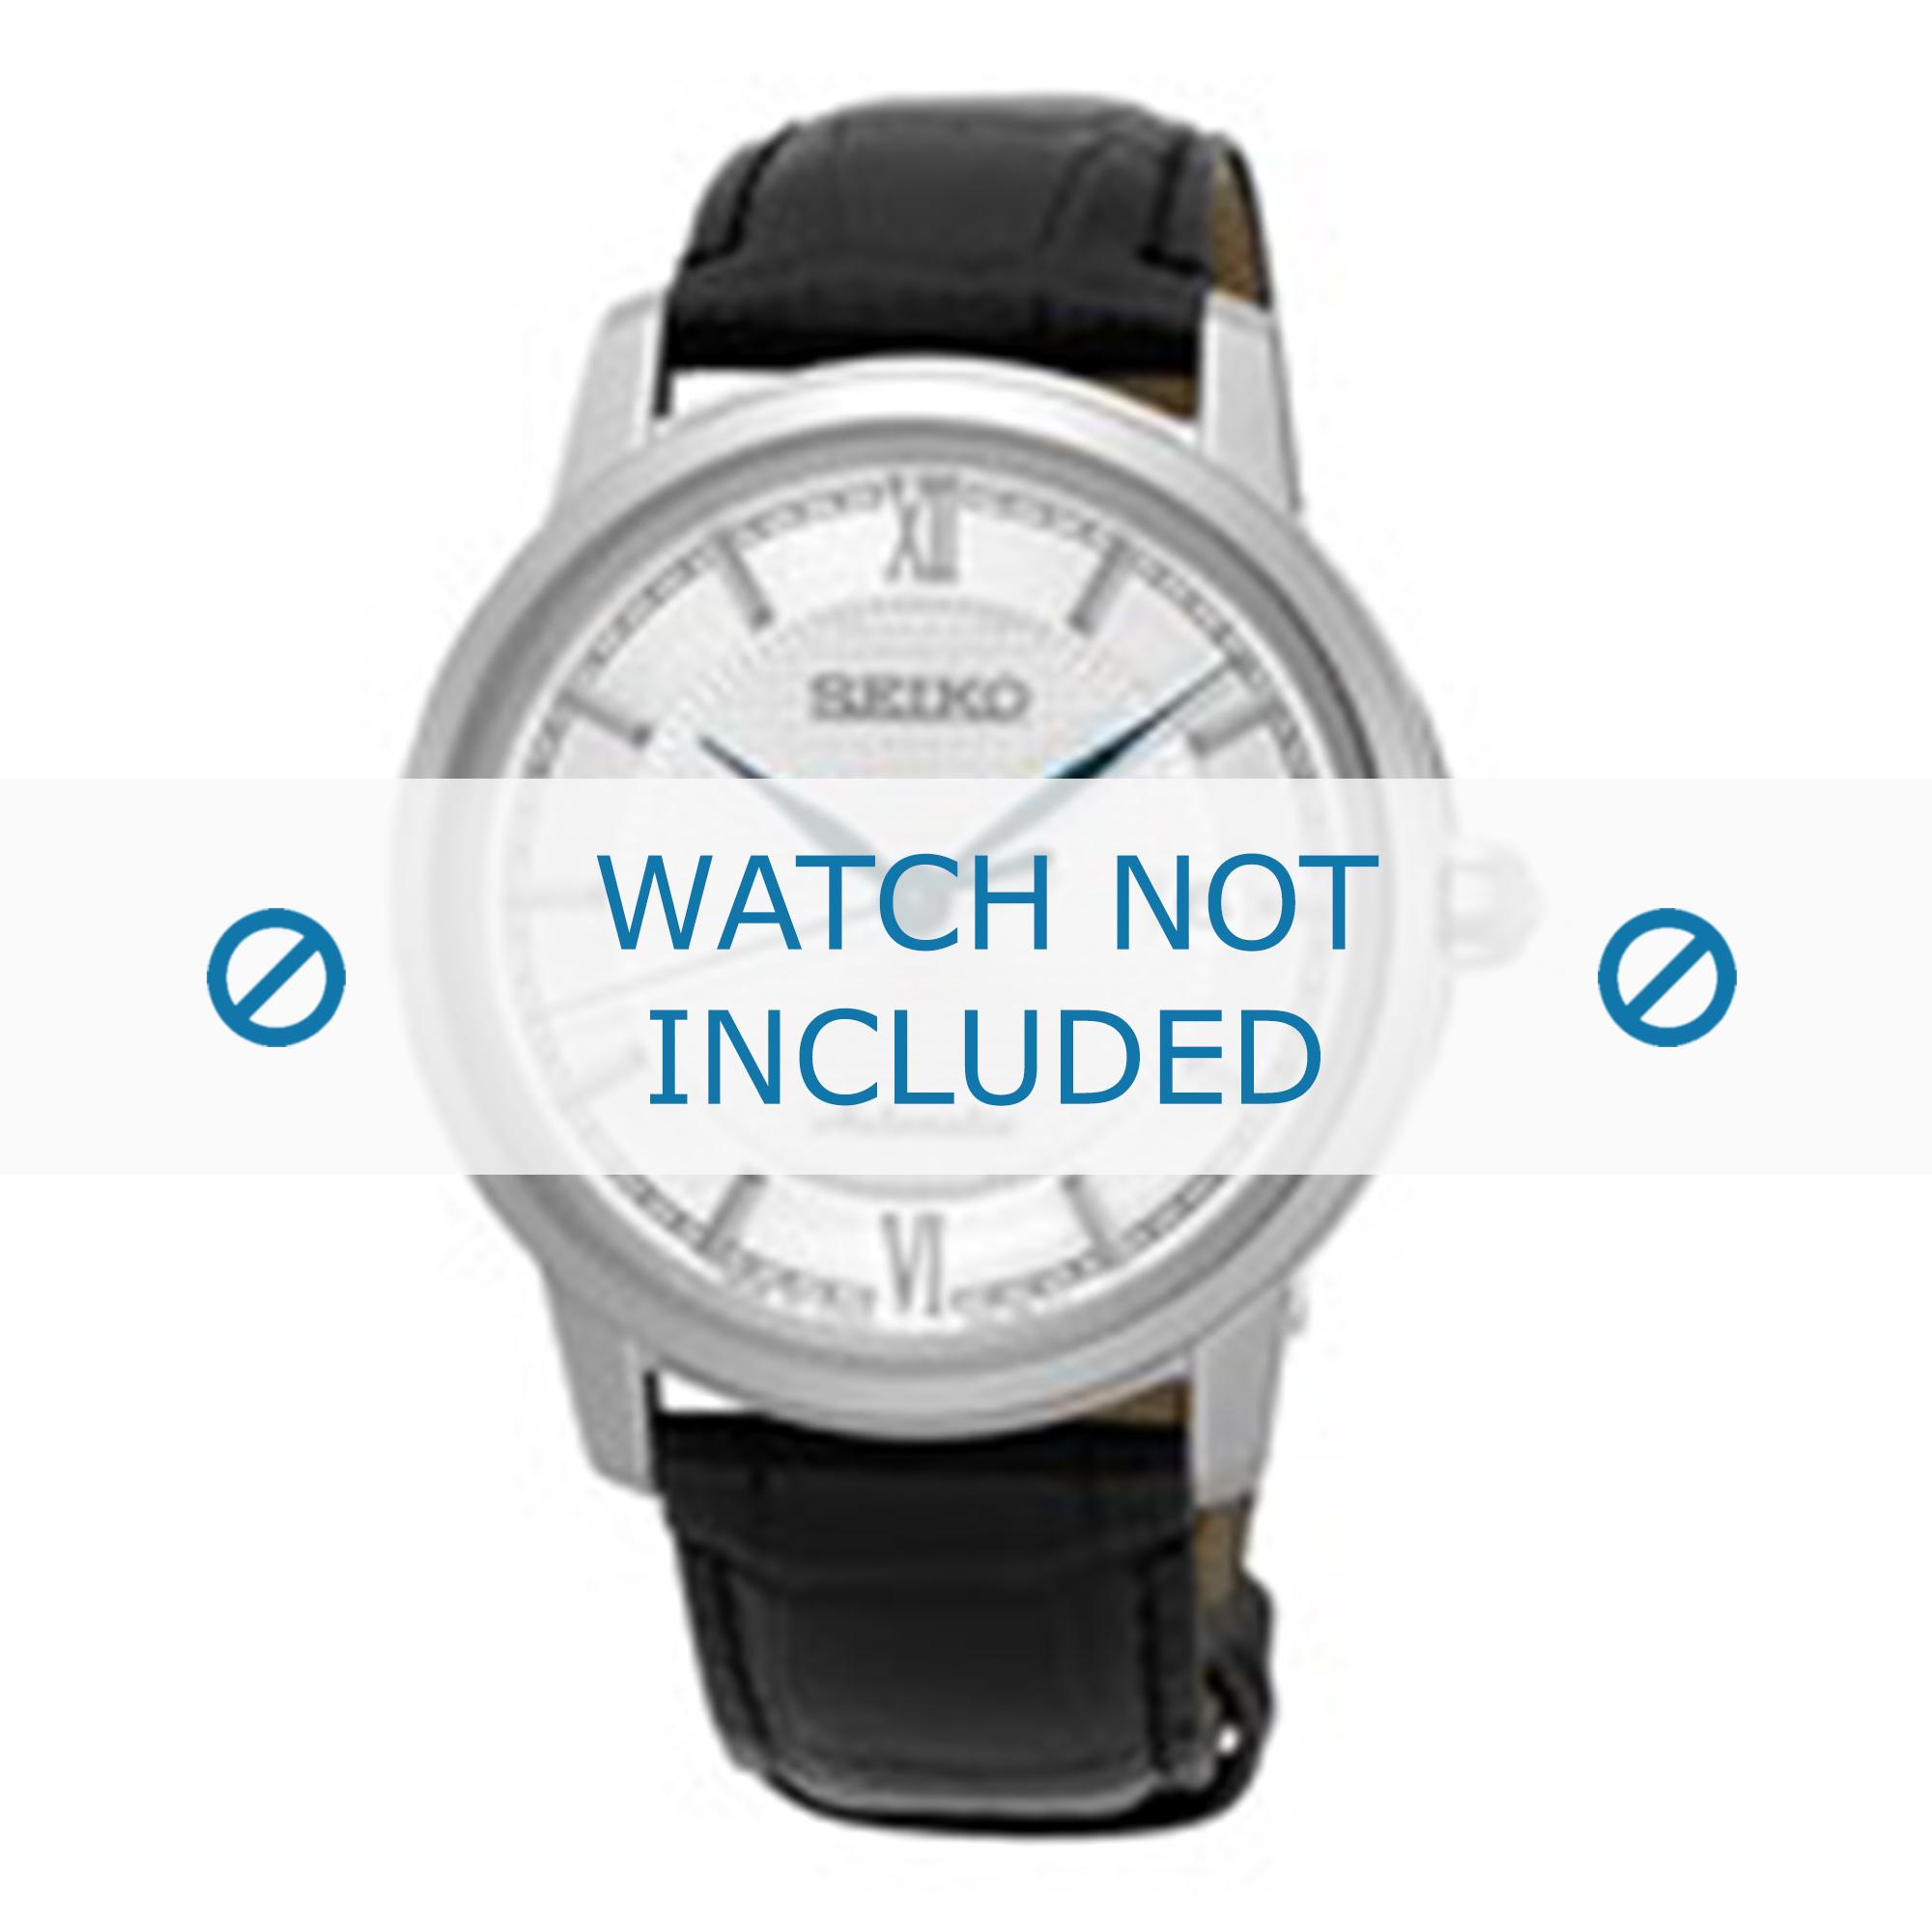 Seiko horlogeband SRPA13J1 / 4R35 01A0 Leder Zwart 20mm + zwart stiksel